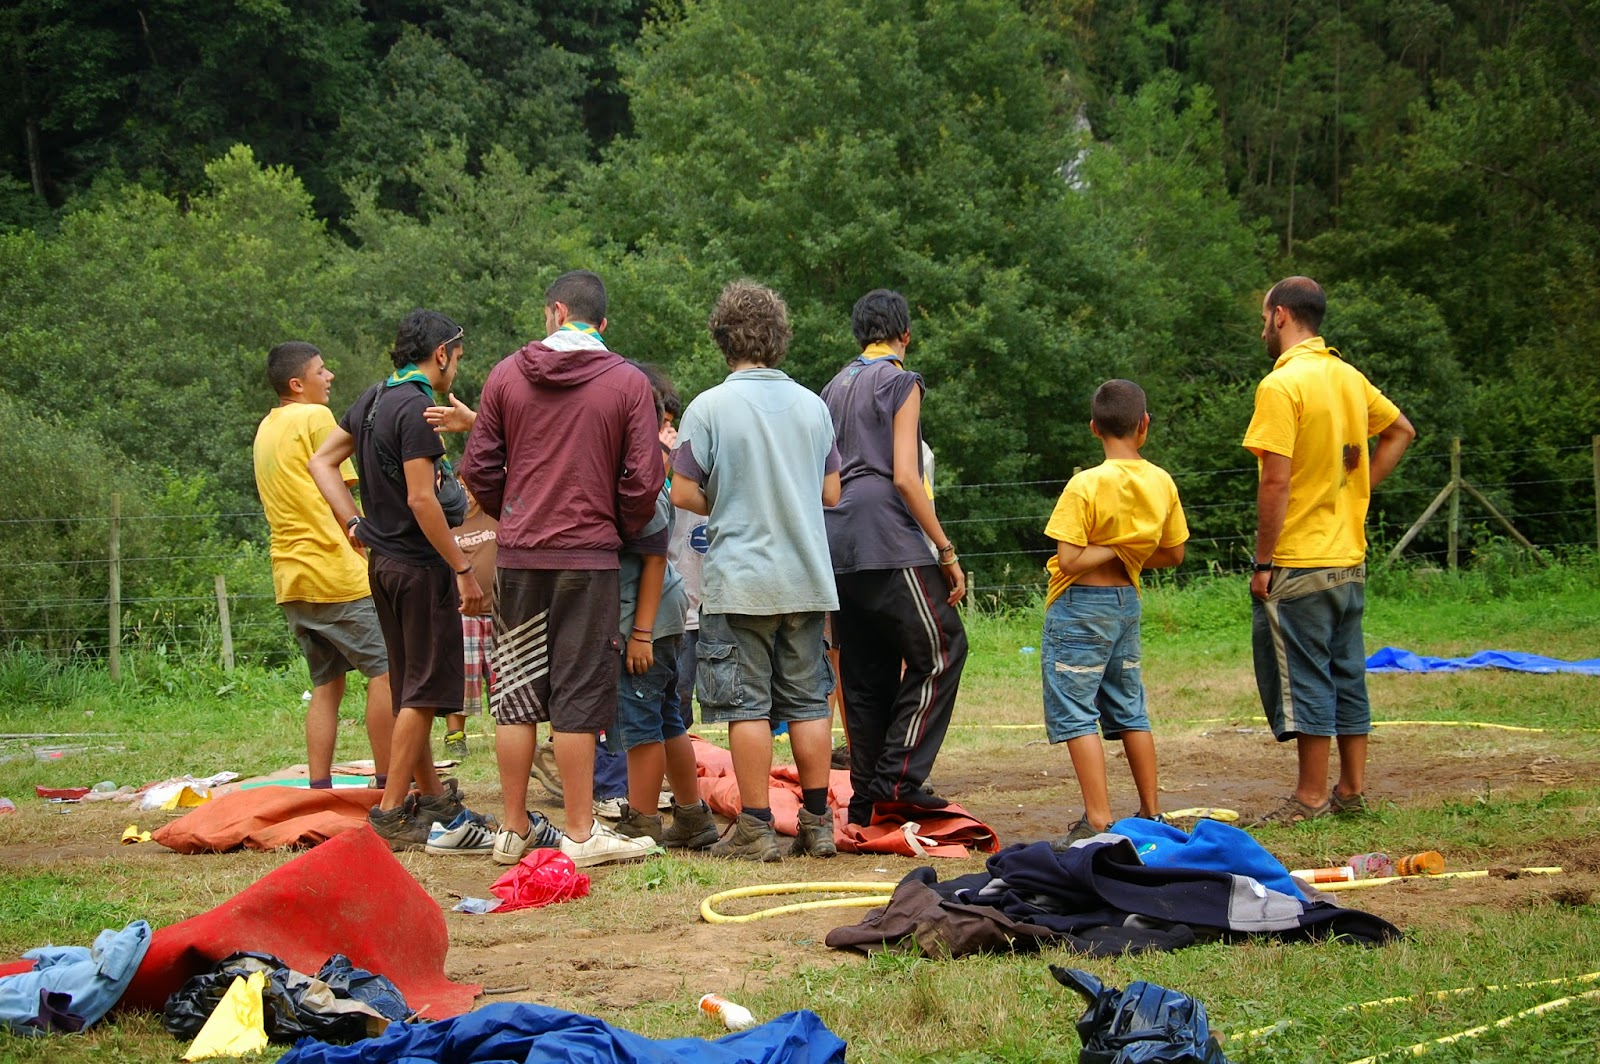 Campaments Estiu RolandKing 2011 - DSC_0312%2B2.JPG